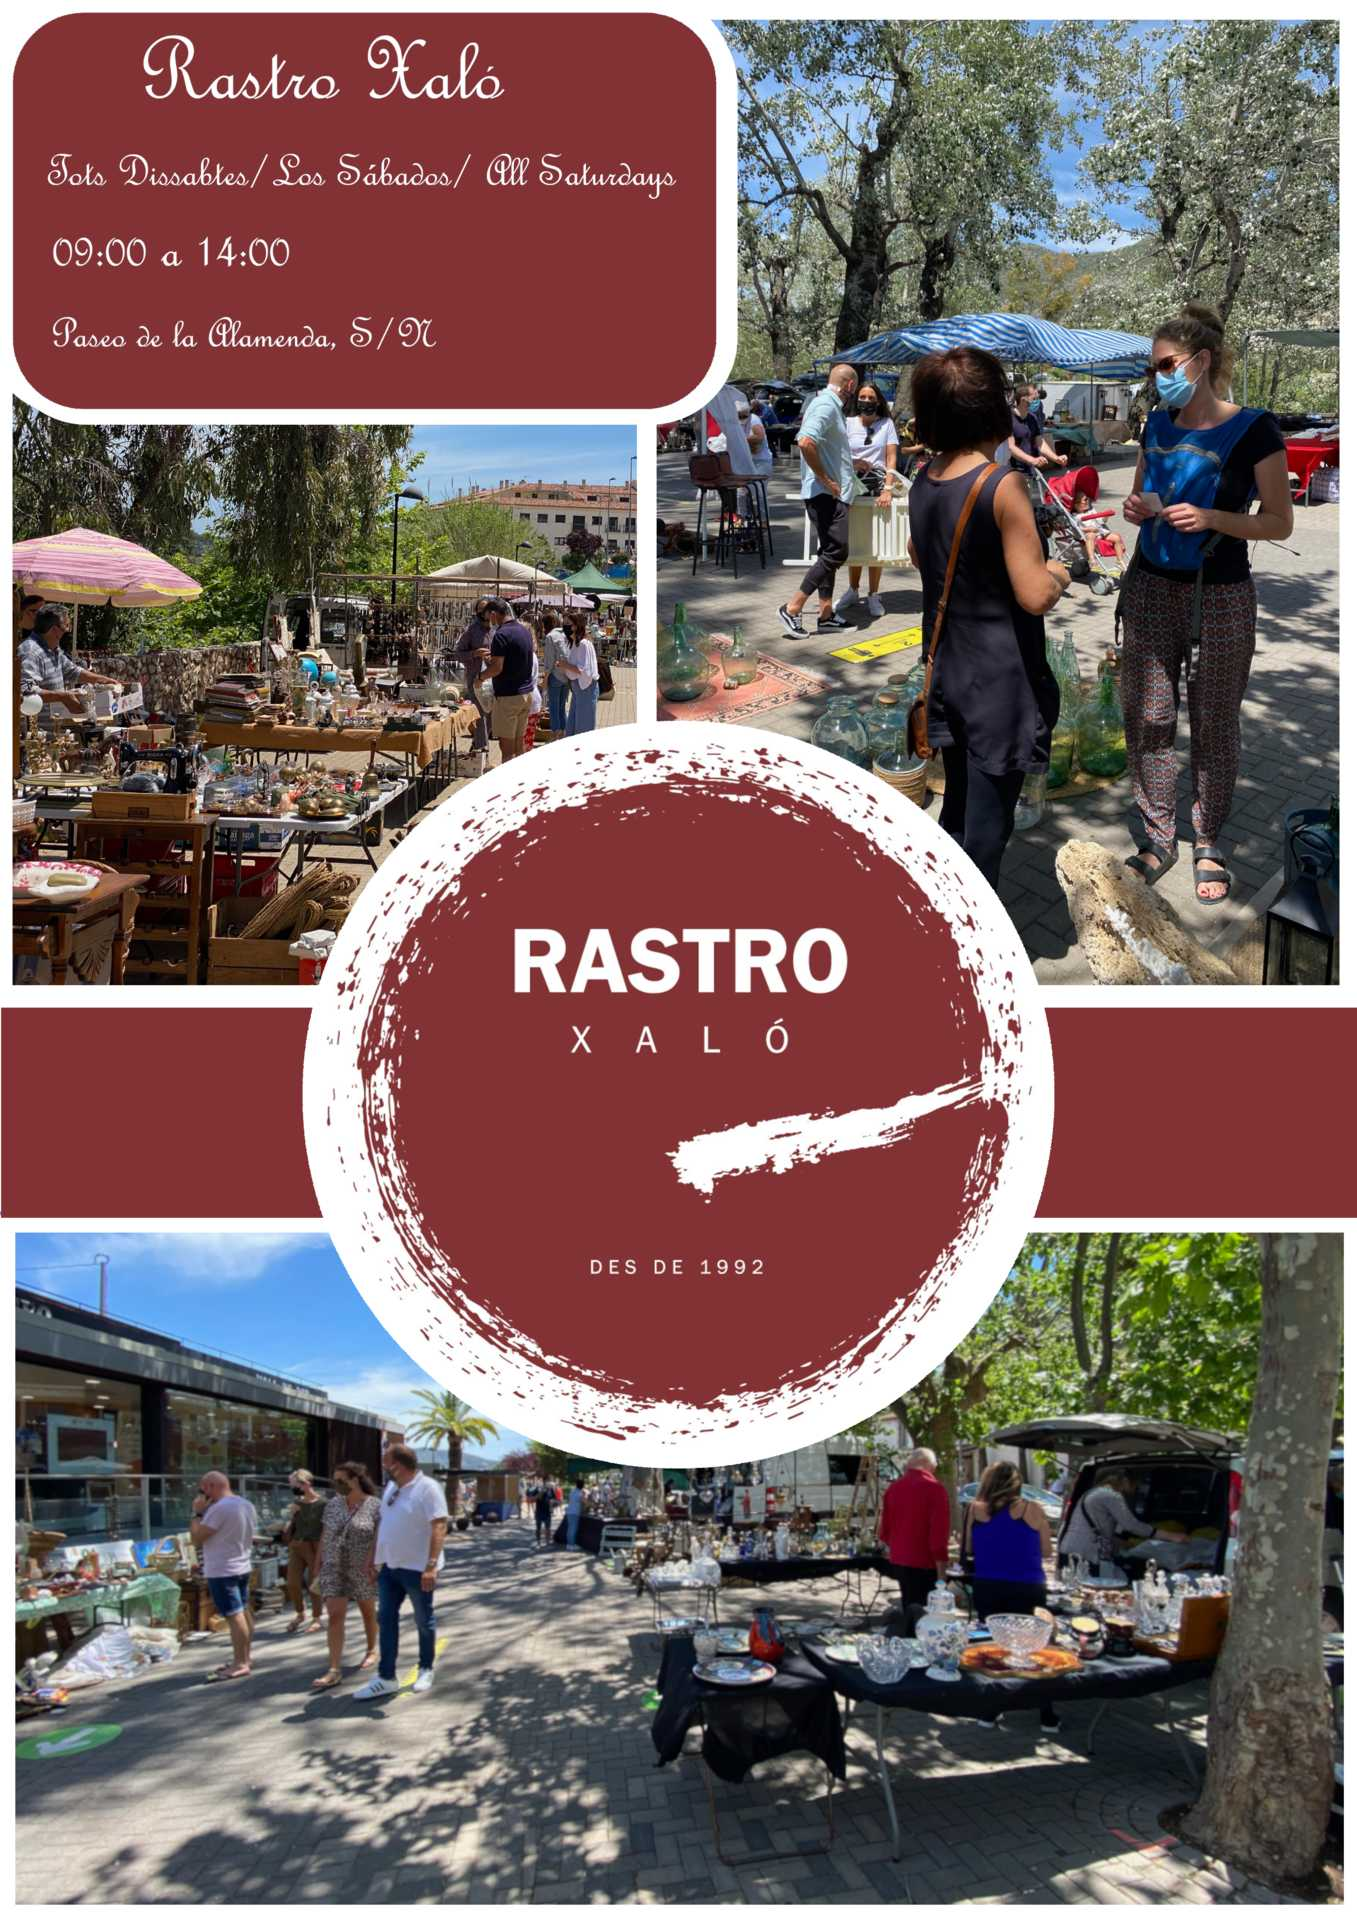 Rastro - Xaló